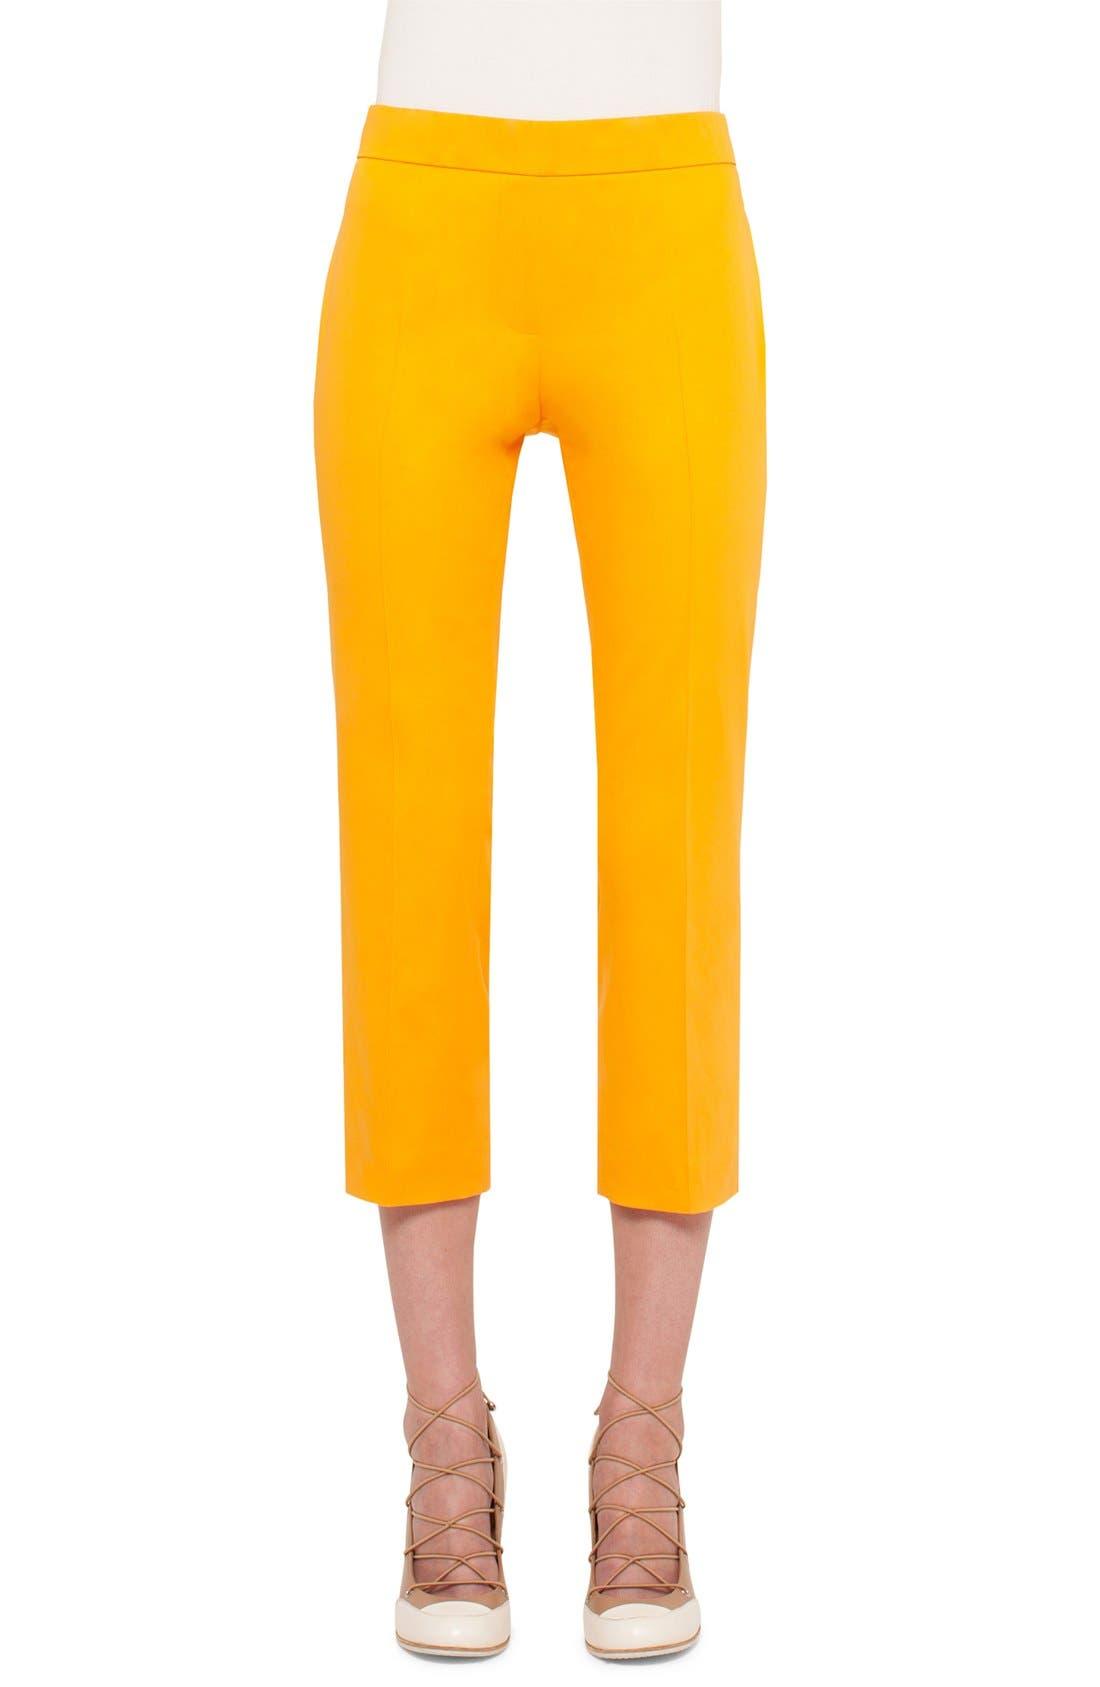 Alternate Image 1 Selected - Akris punto 'Francella' Stretch Cotton Crop Pants